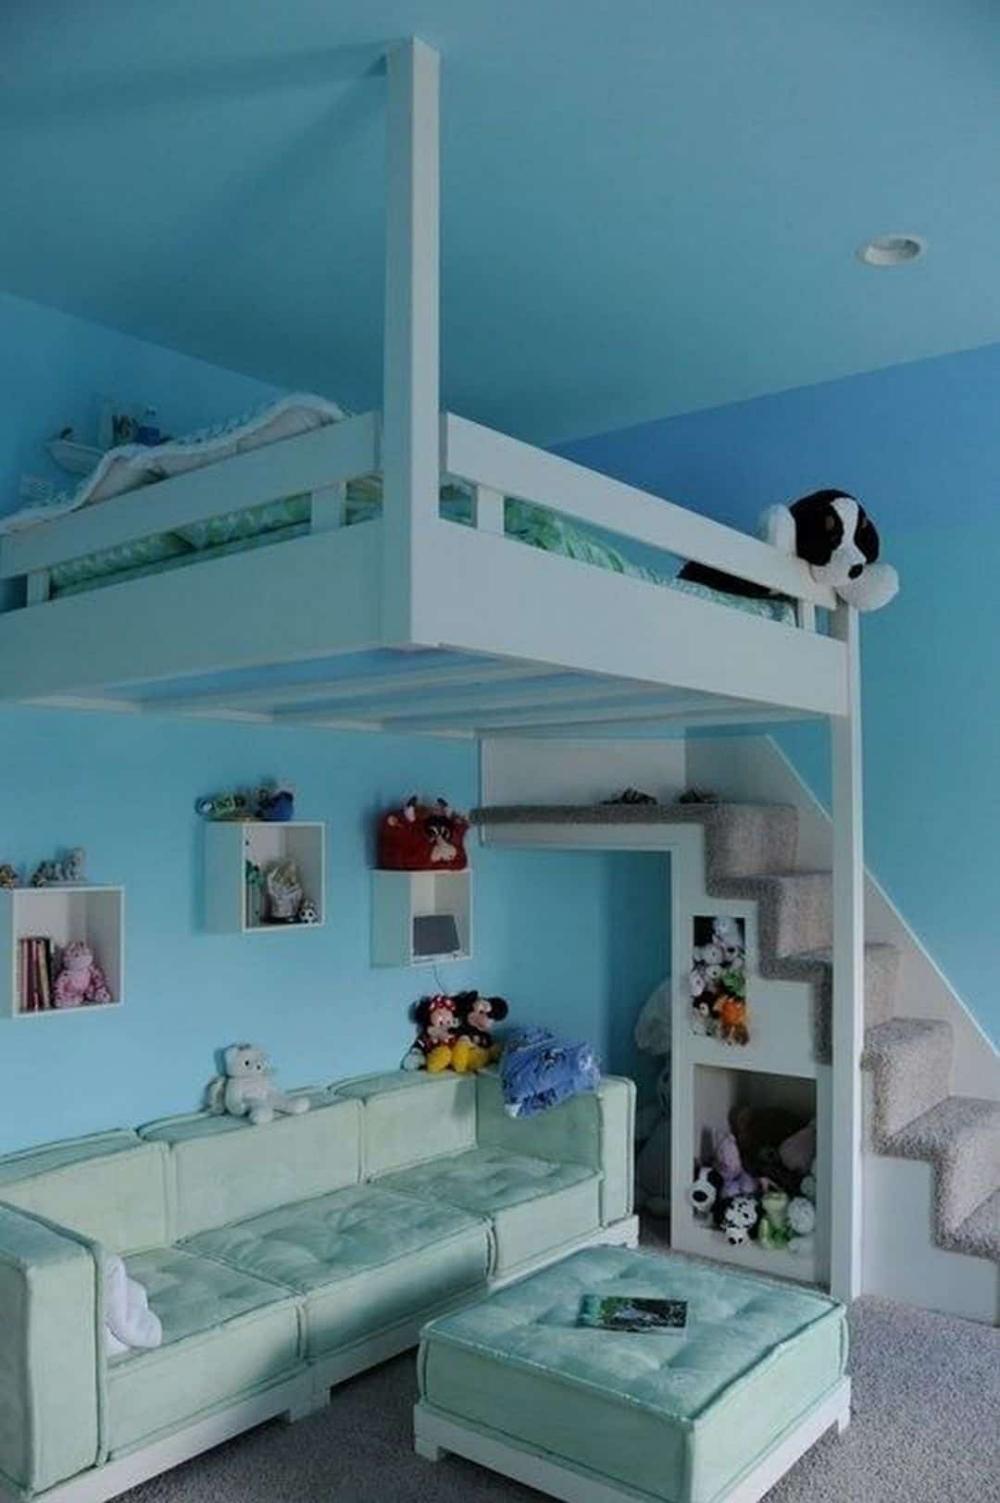 10 Unique House Decoration and Design Ideas for Yo